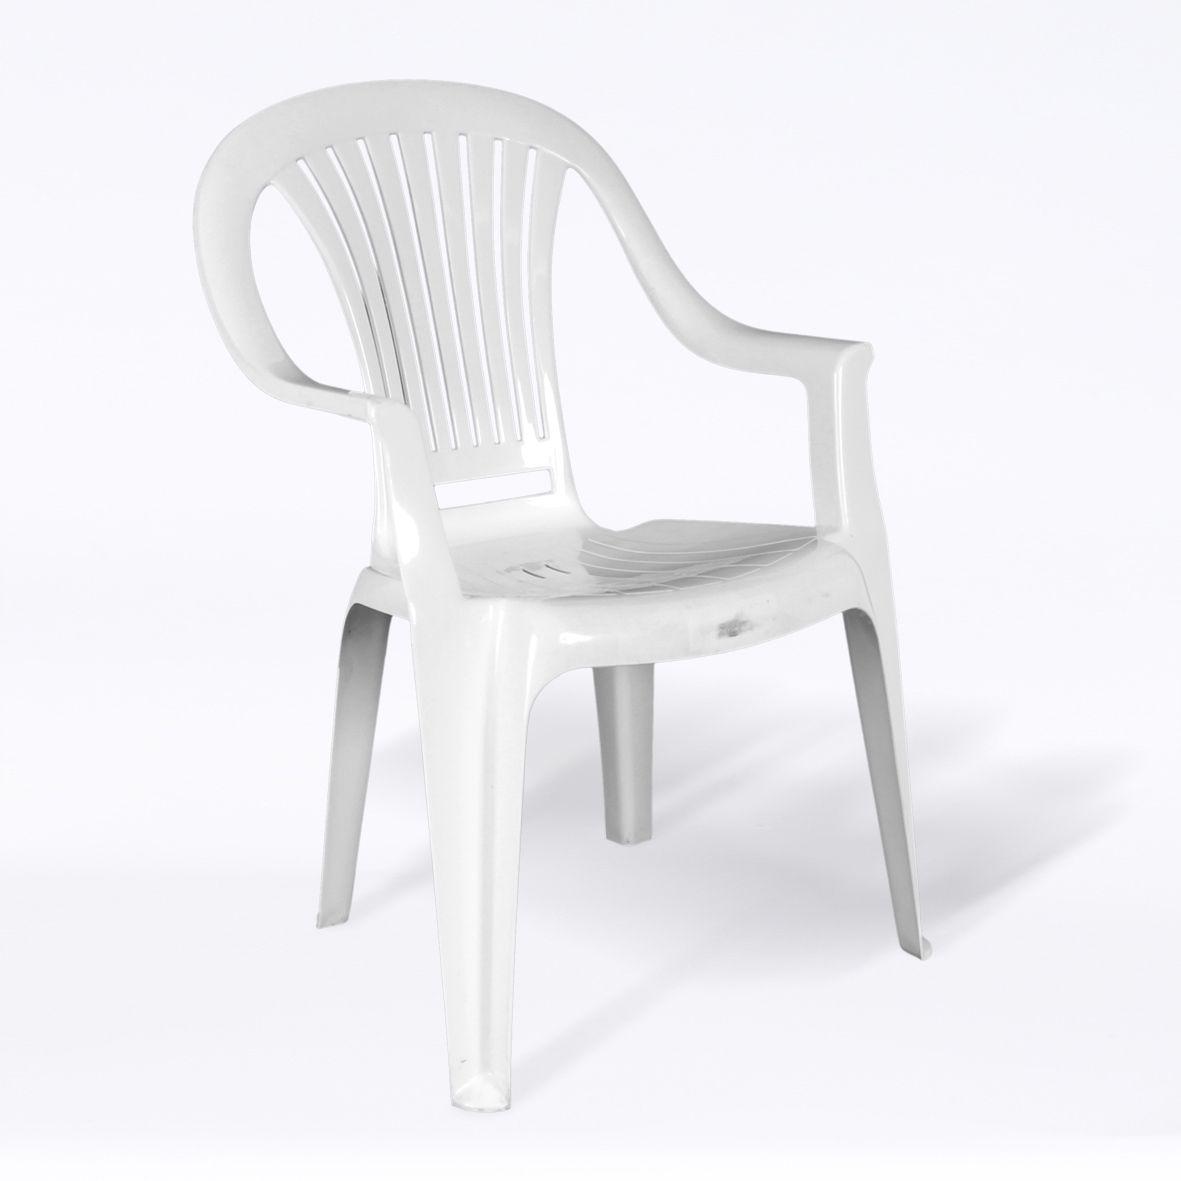 20 Plastic Outdoor Chairs Walmart Best Paint For Interior Walls